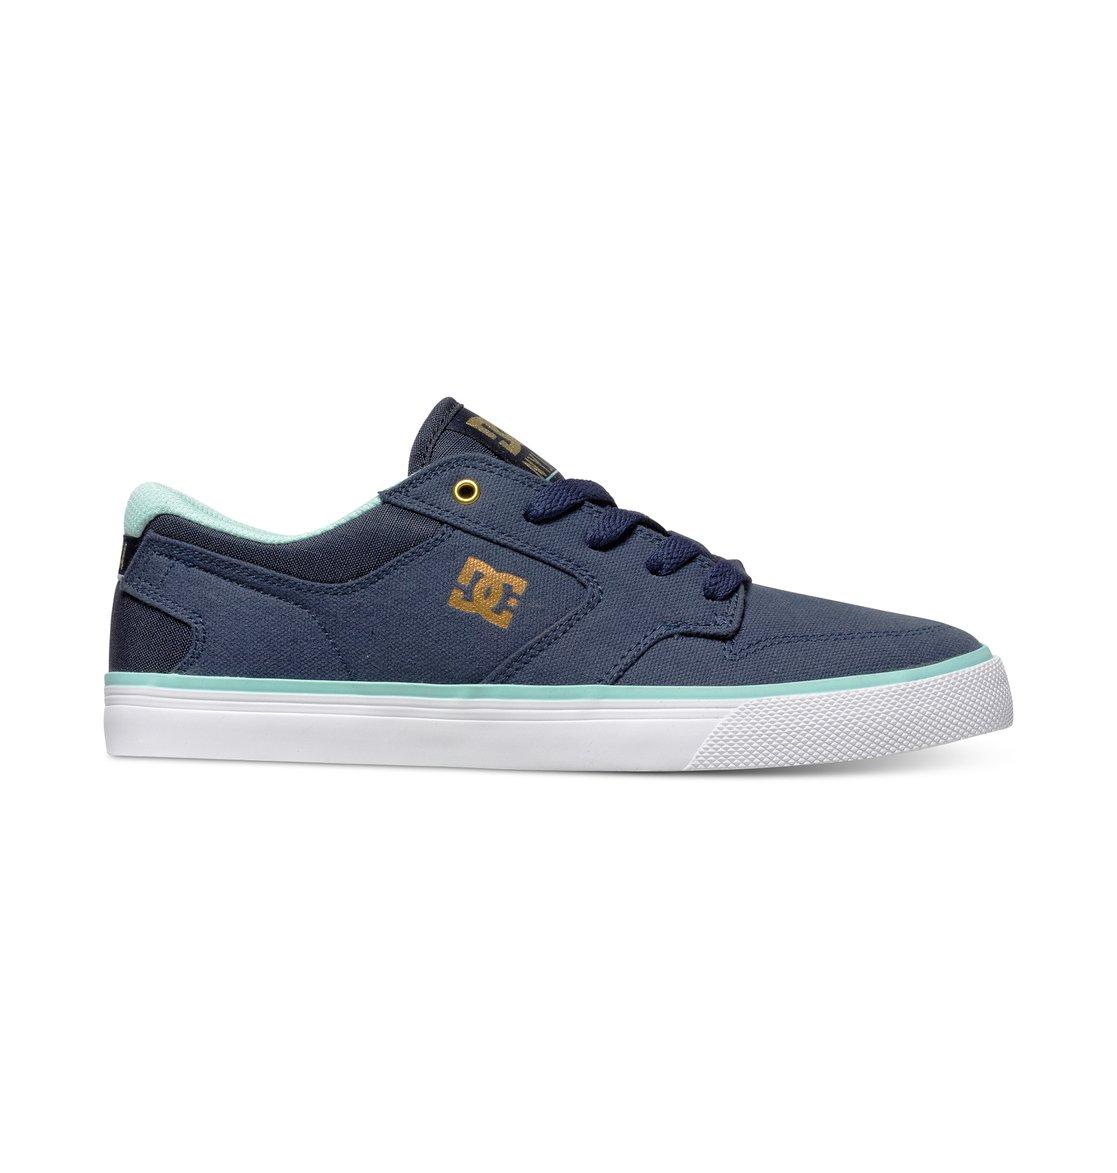 DC - Jungen Nyjah 2 Vulc Lowtop Schuhe, Black/Blue, 36 EU / 5 US